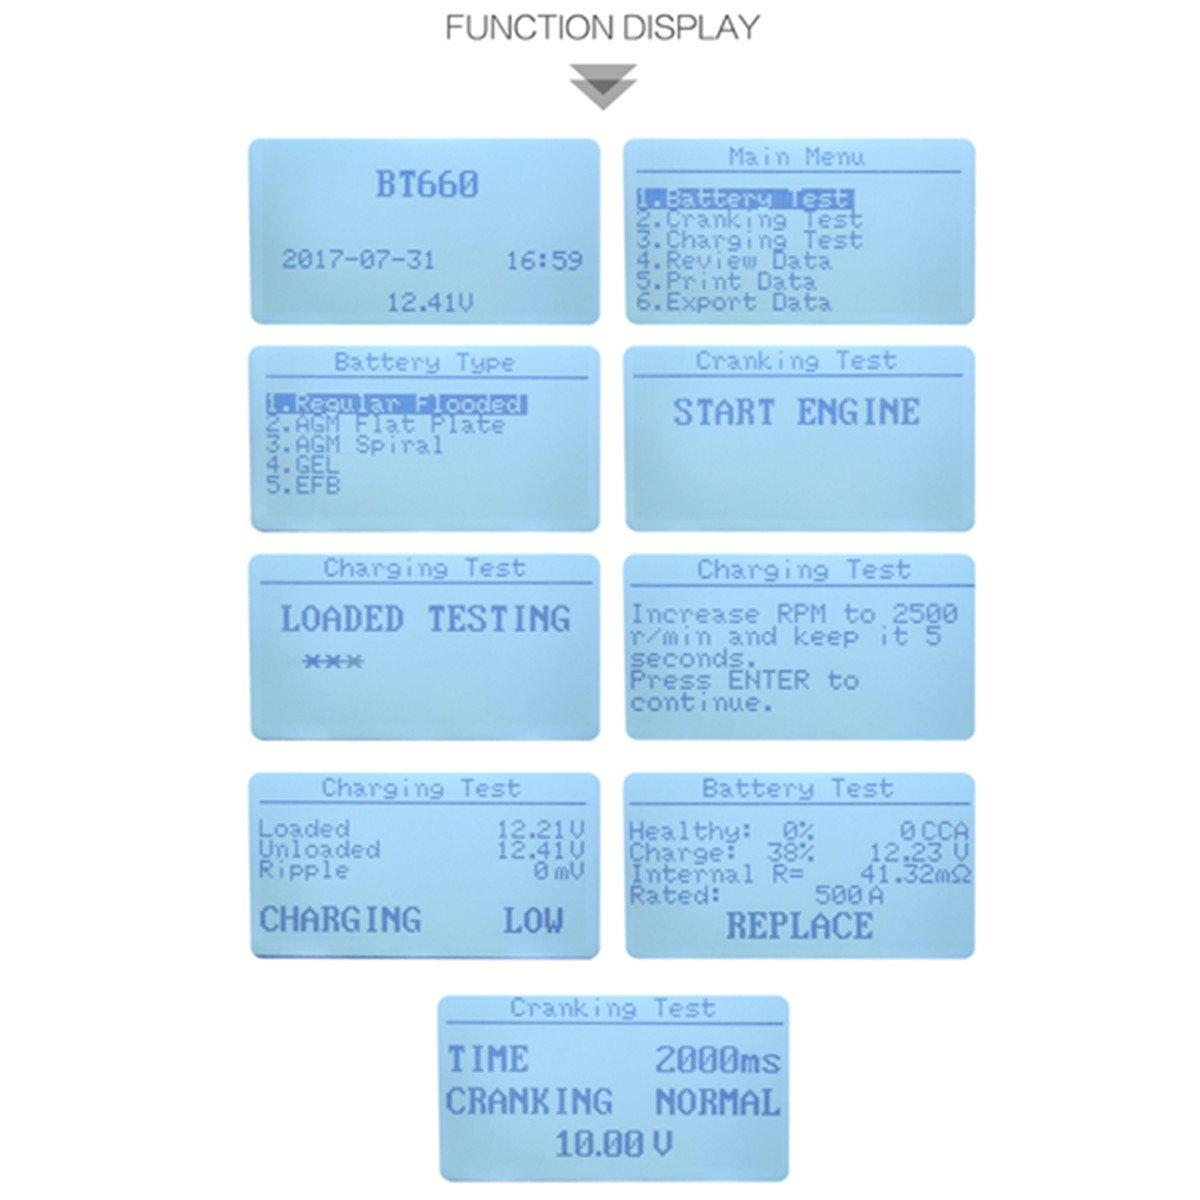 TuLanAuto 12V/24V Autool BT660 Battery Conductance Tester BT-660 Auto Battery Testers Automotive Diagnostic Tools For Heavy Duty Trucks, Light Duty Truck, Cars by TuLanAuto (Image #4)